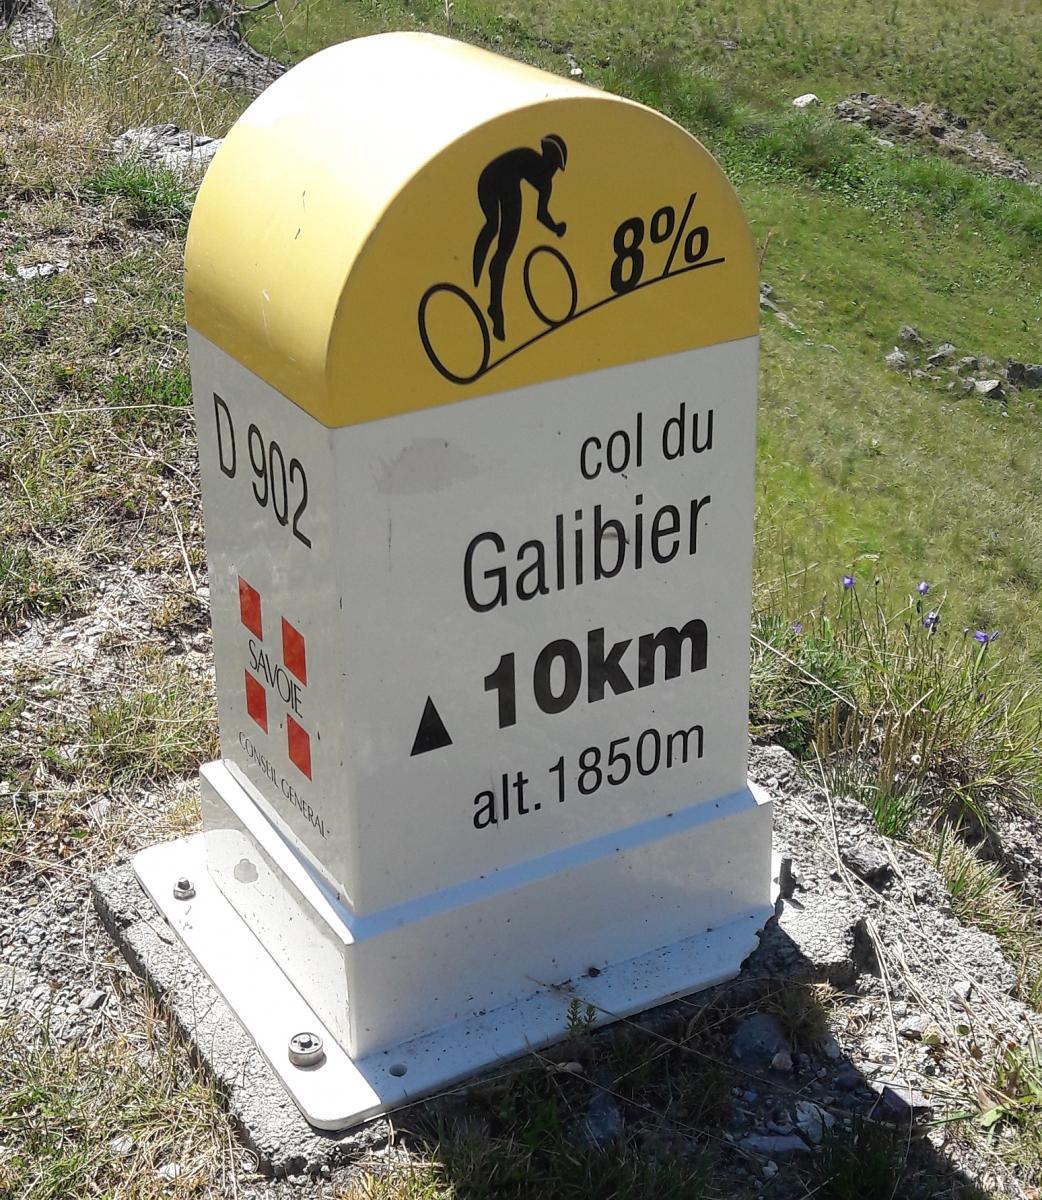 Nächstes Etappenziel Col du Galibier